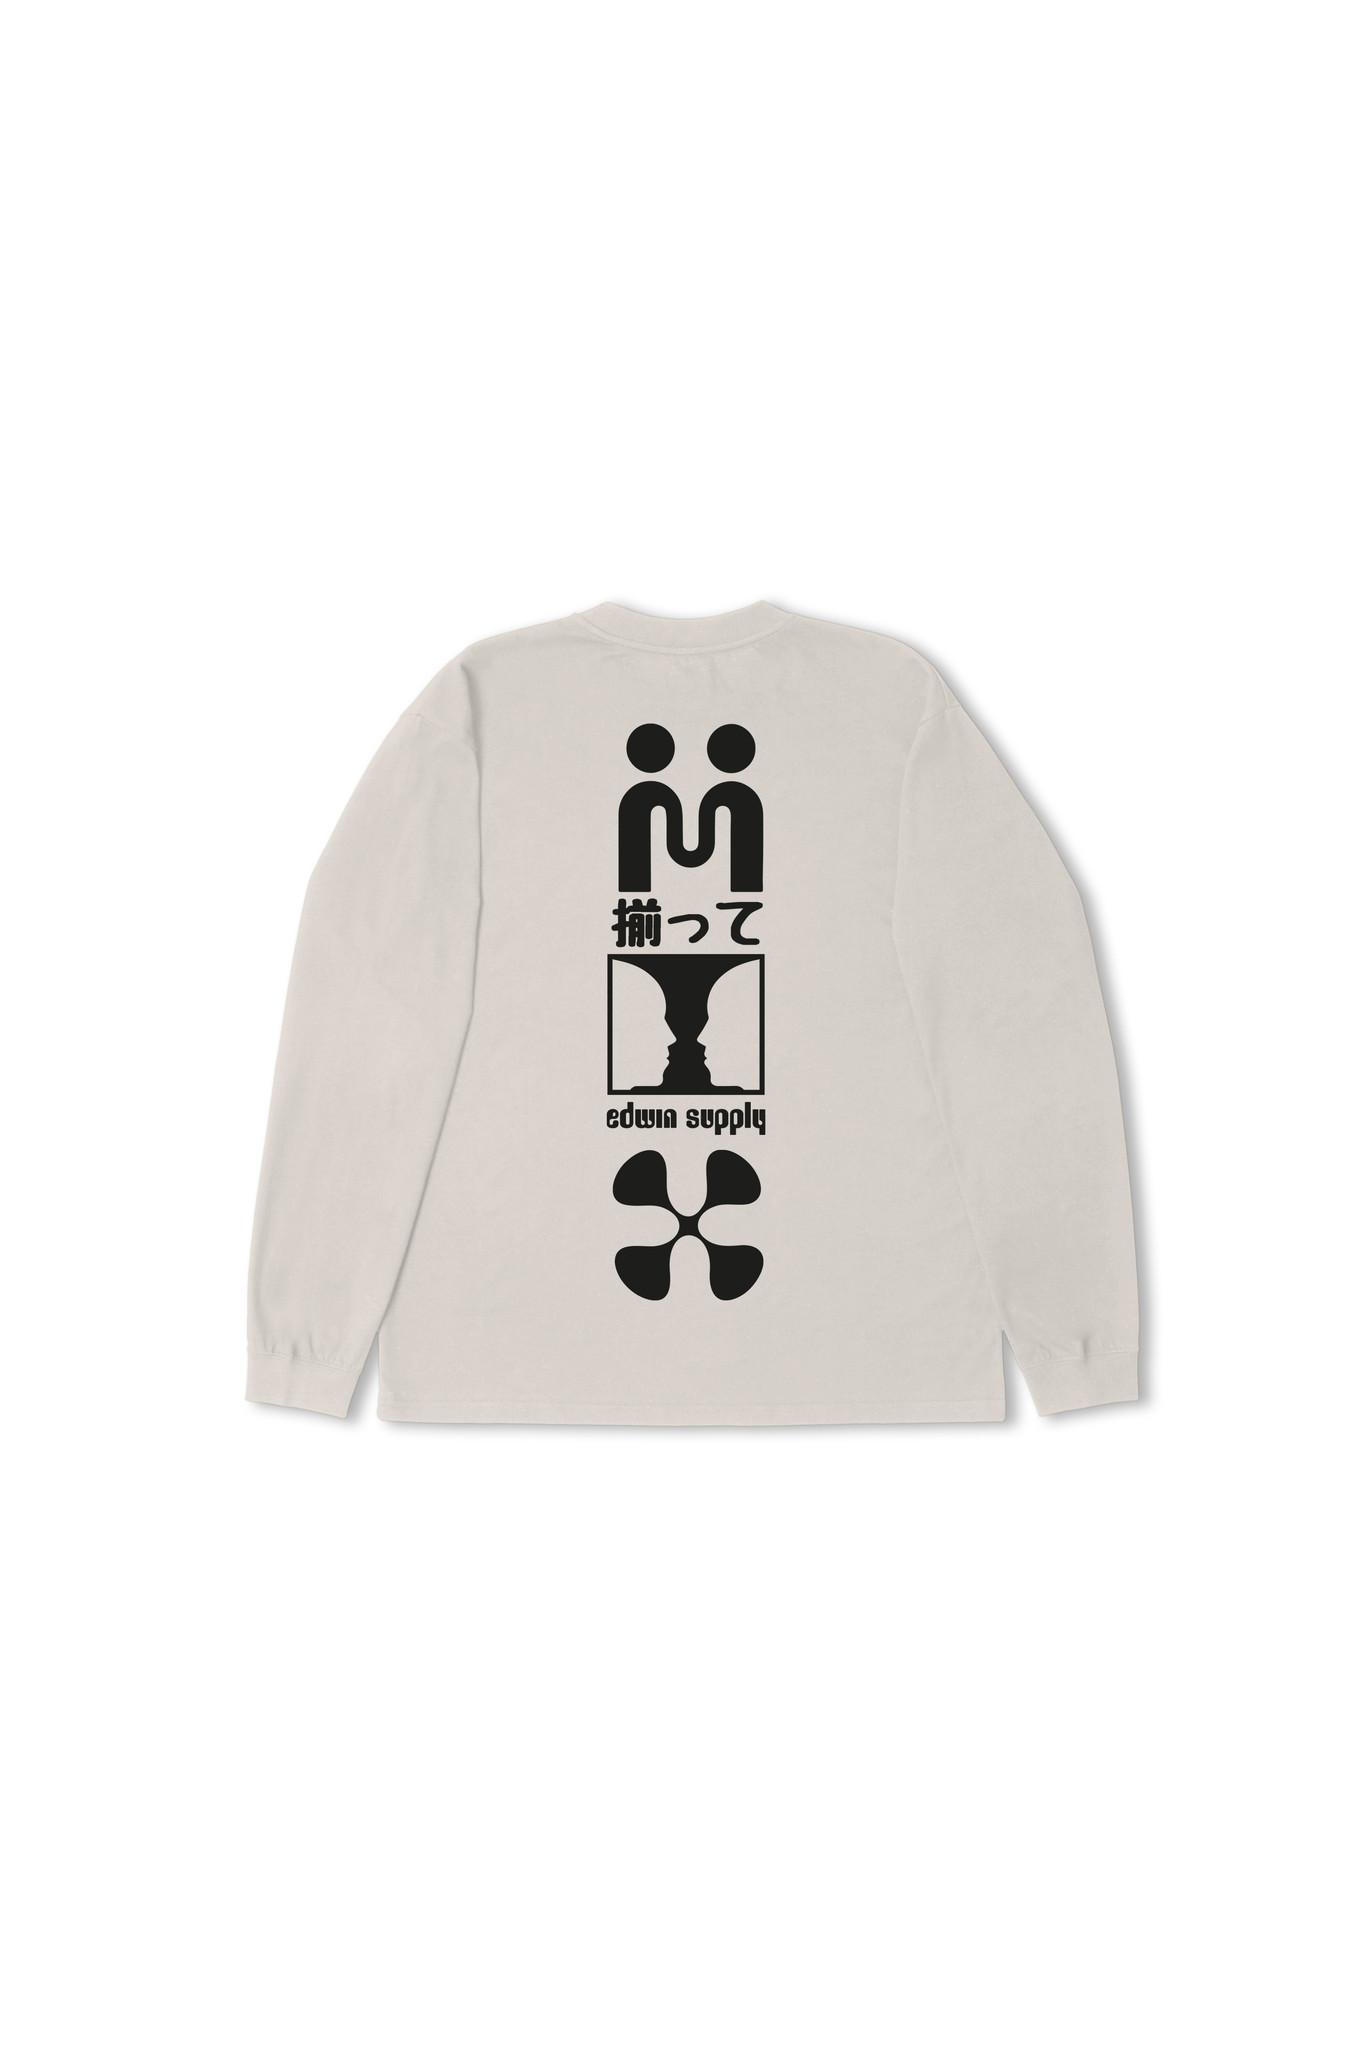 Supply Long-sleeve T-shirt Silver Grey-3